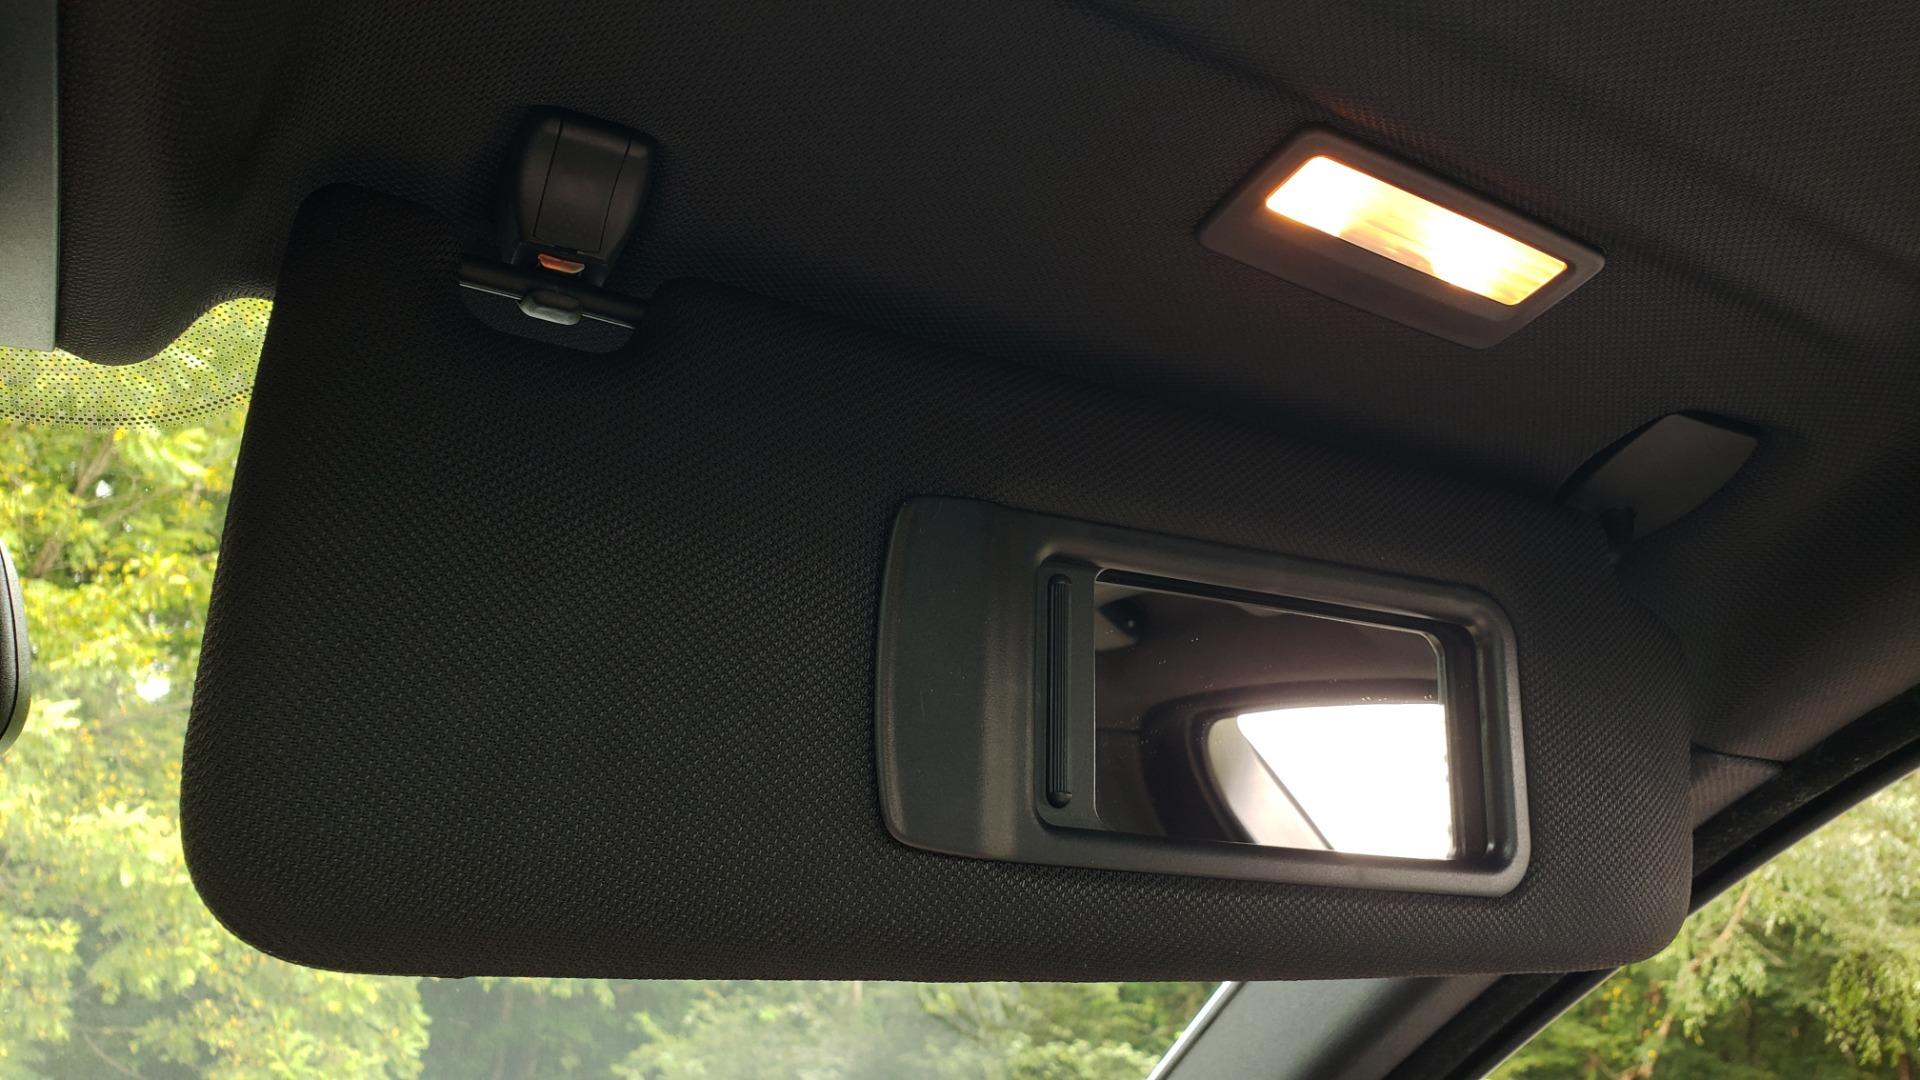 Used 2012 BMW 5 SERIES 550I M SPORT / NAV / CONV PKG / SUNROOF / PREM SND / REARVIEW for sale Sold at Formula Imports in Charlotte NC 28227 43